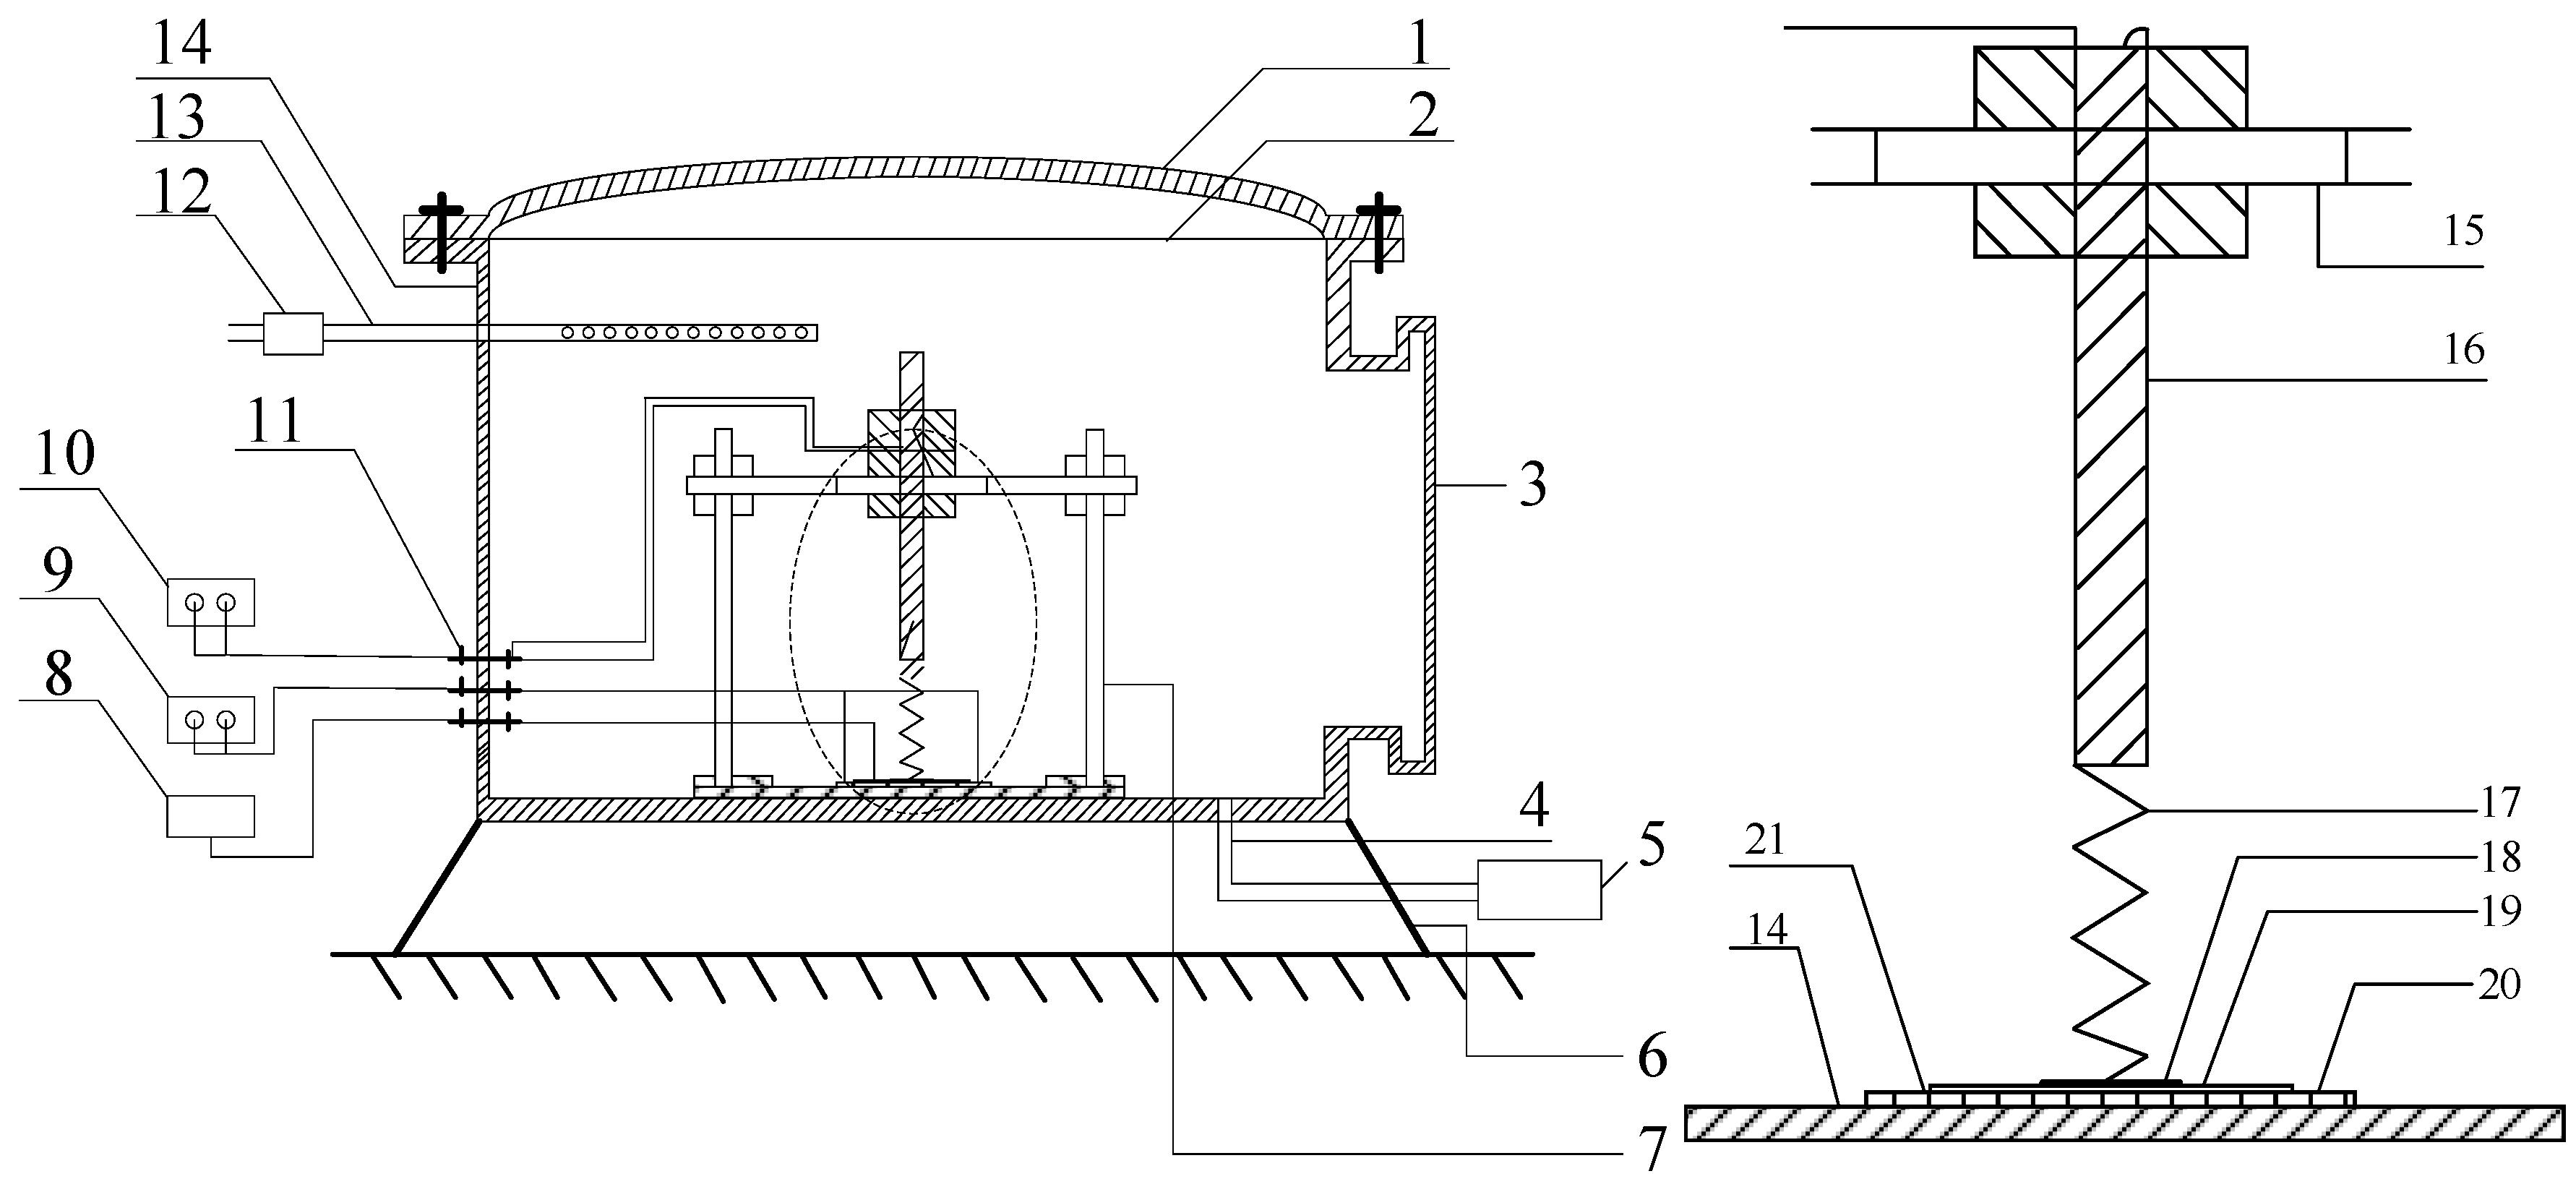 voltage regulator wiring diagram on 856 ih tractor